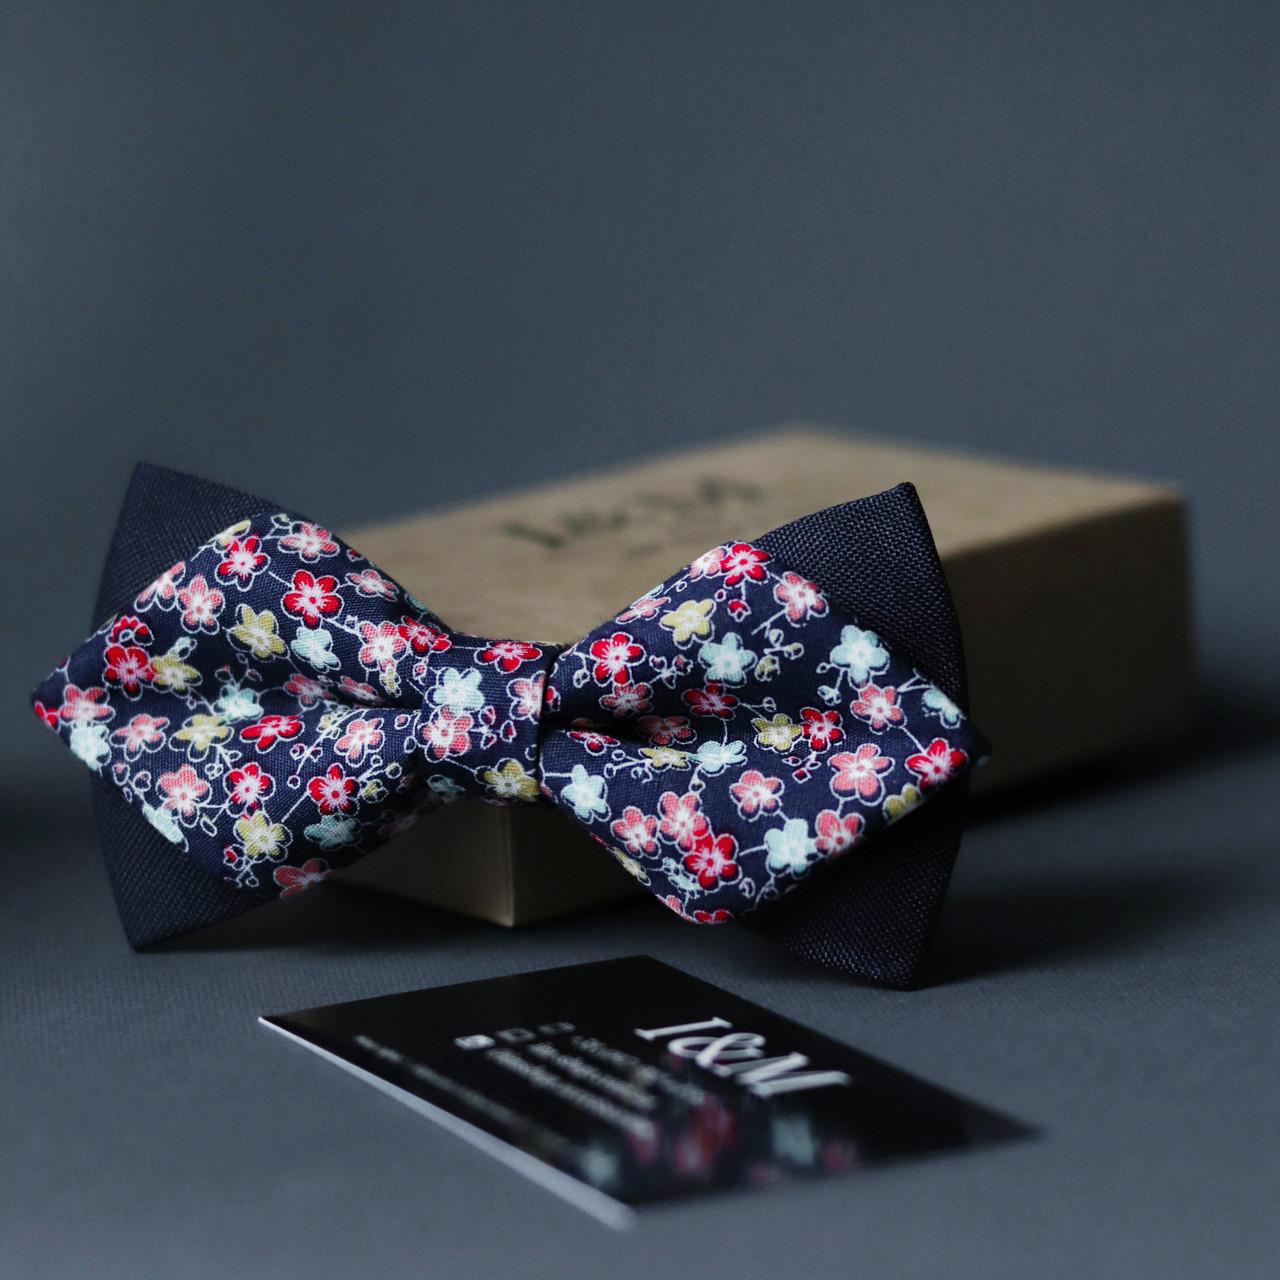 Краватка-метелик I&M Craft з гострими кінцями синій в квіточки (100160N)